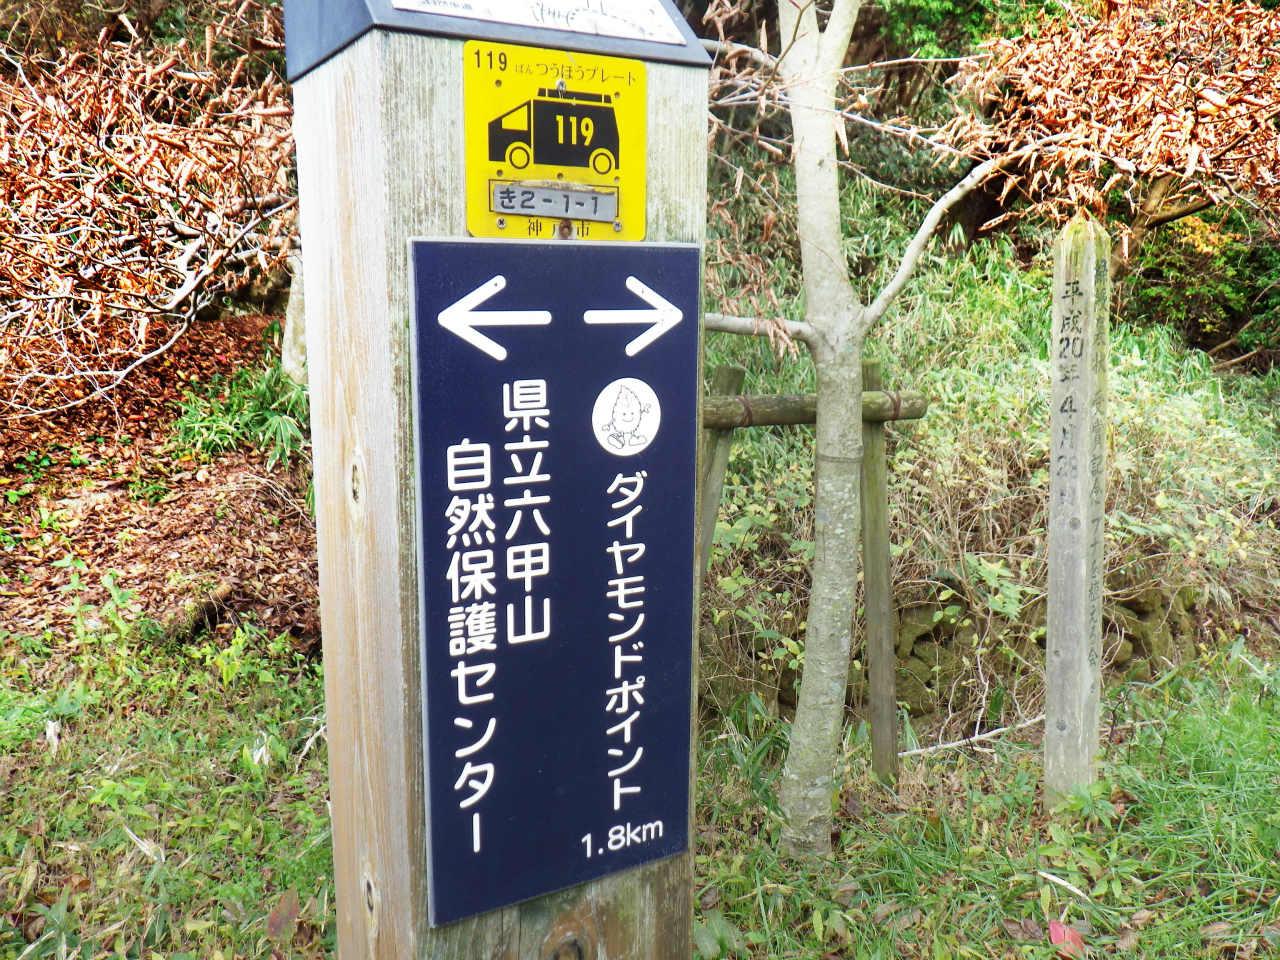 04a 自然観察路の標識